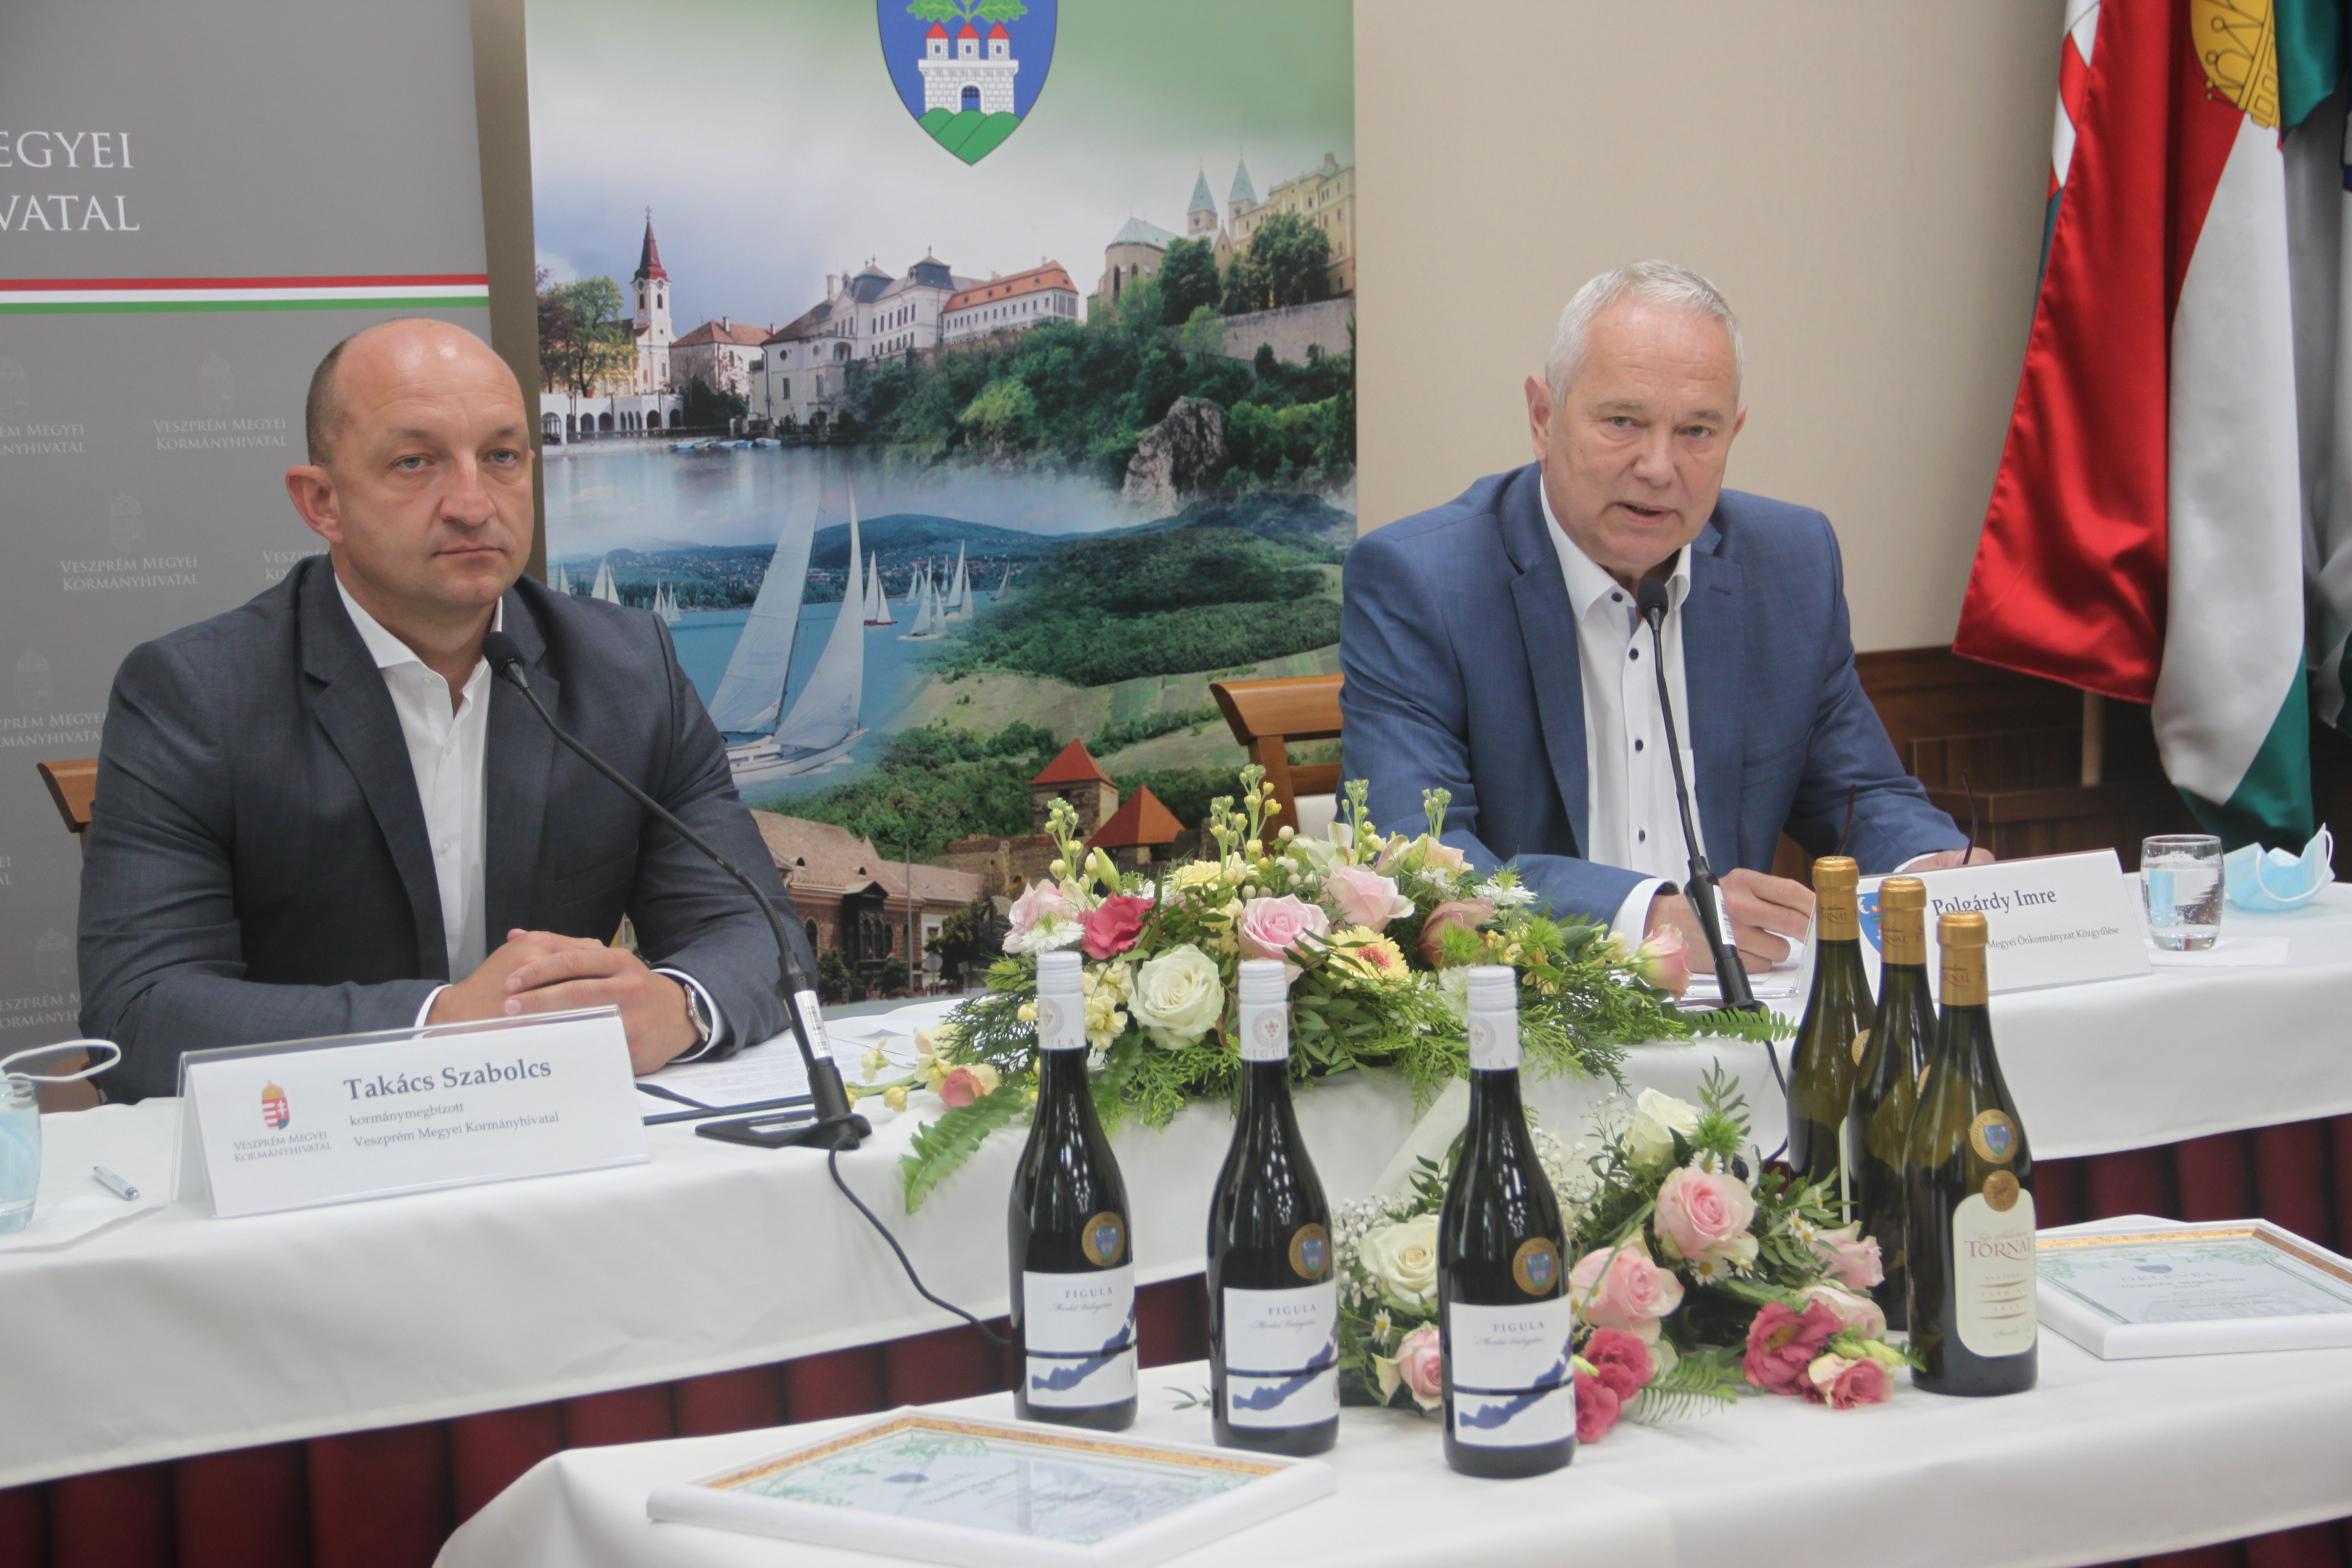 Veszprém megye bora 2021